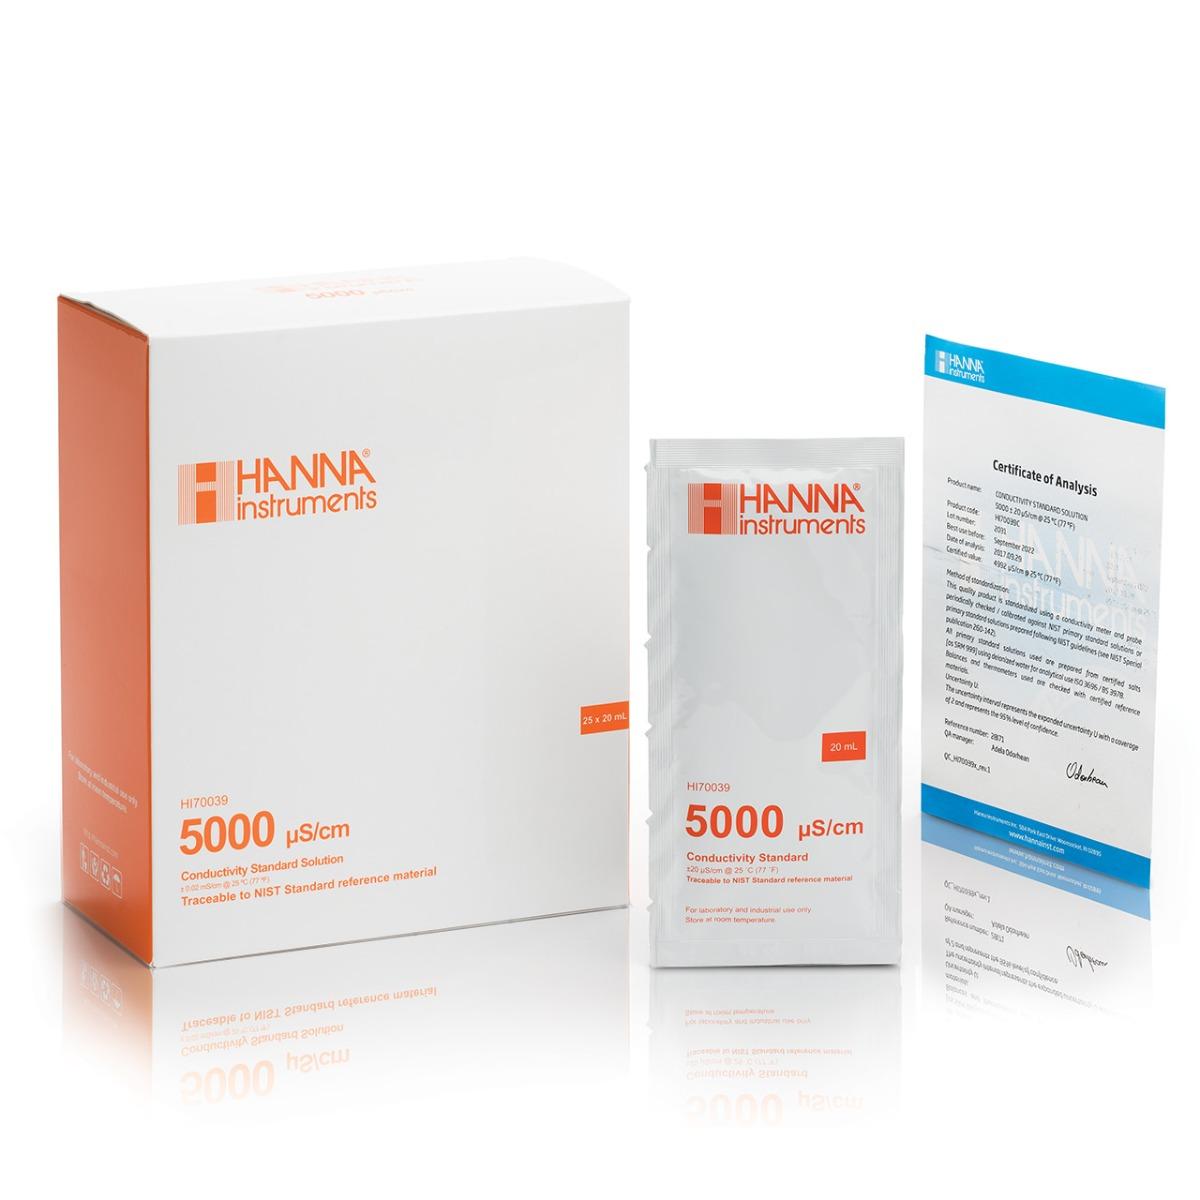 HI70039C 5000 µS/cm EC (25 x 20 mL) sachets with certificate of analysis